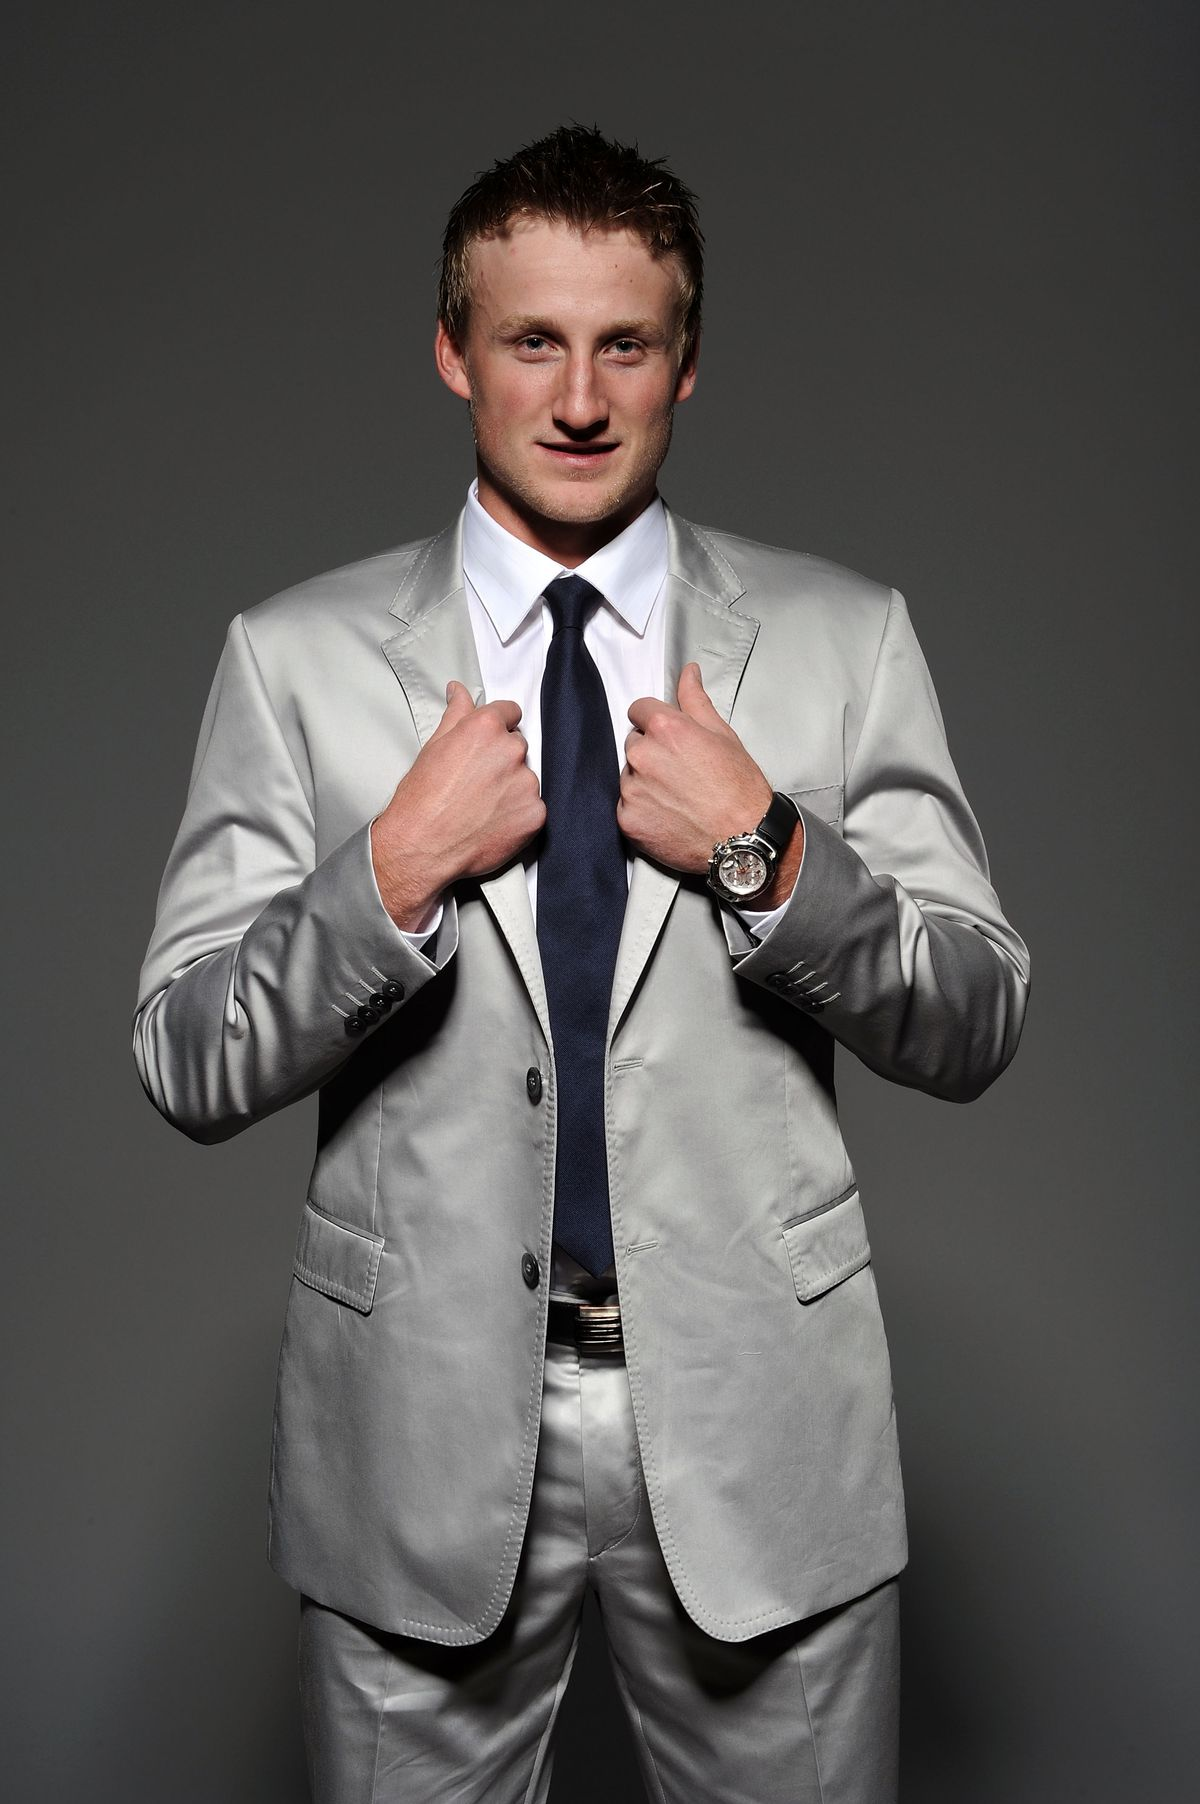 2010 NHL Awards Portraits